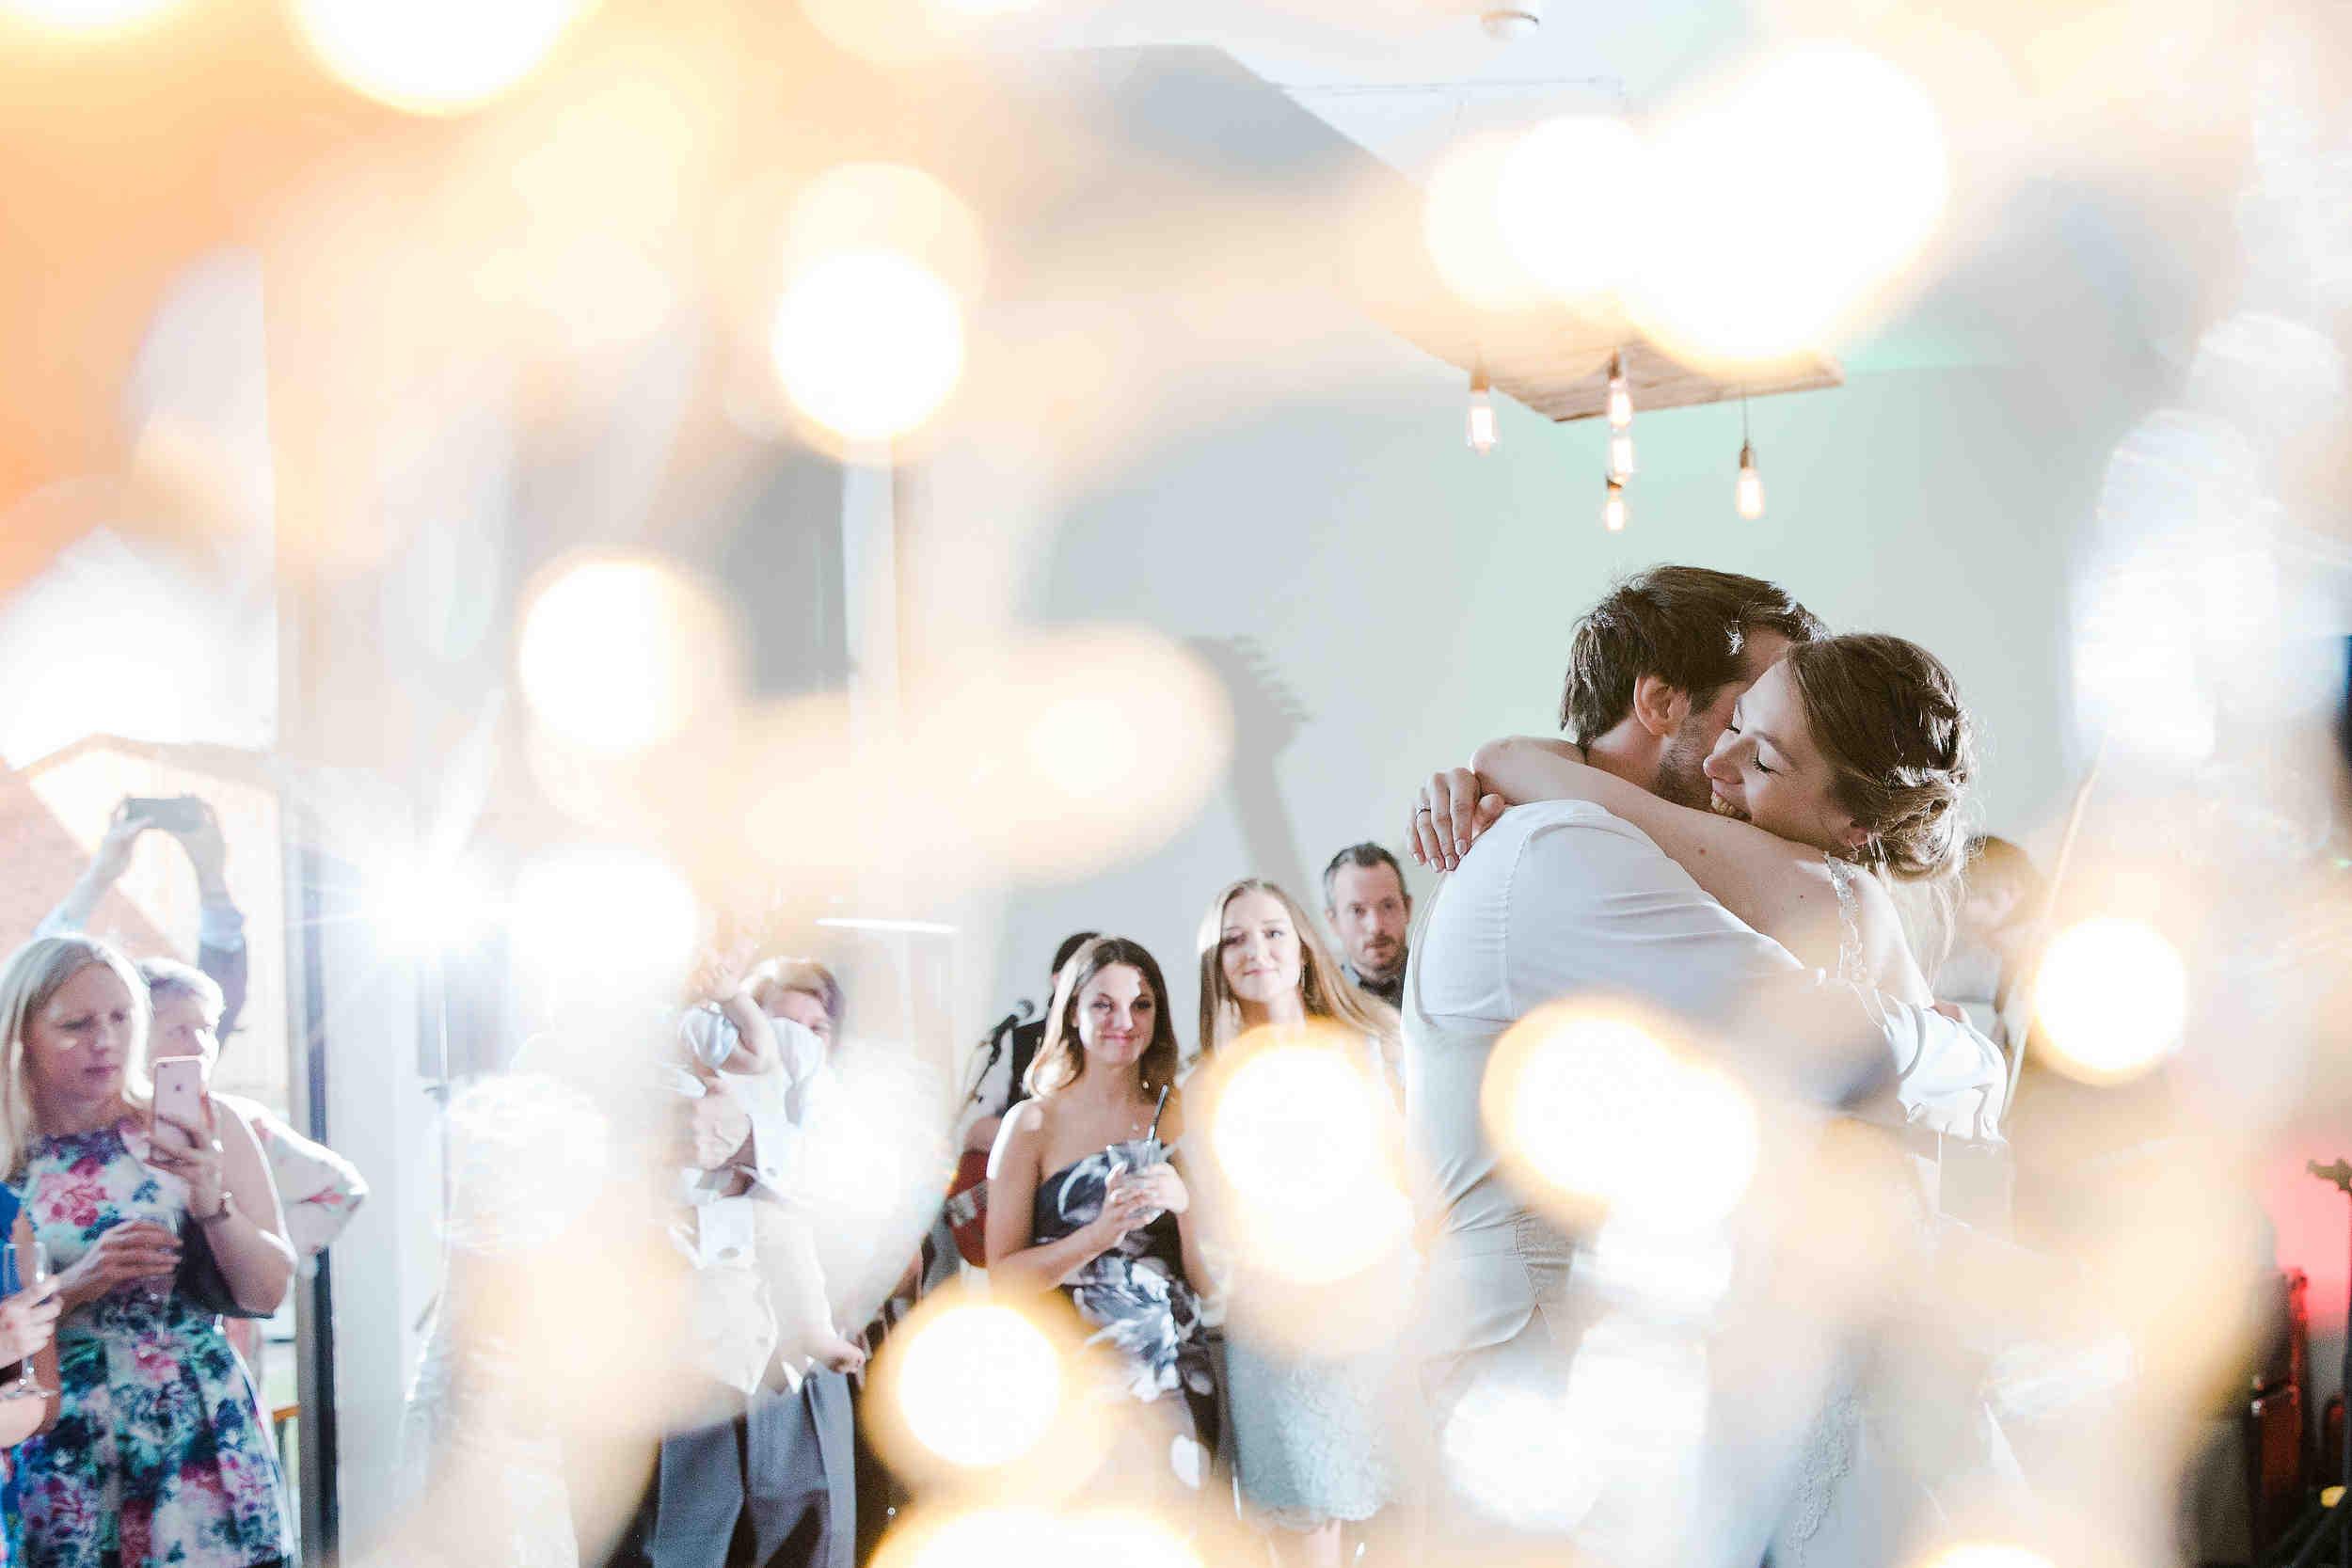 Modern_Stylish_Wedding_at_Swallows_Nest_Barn1308